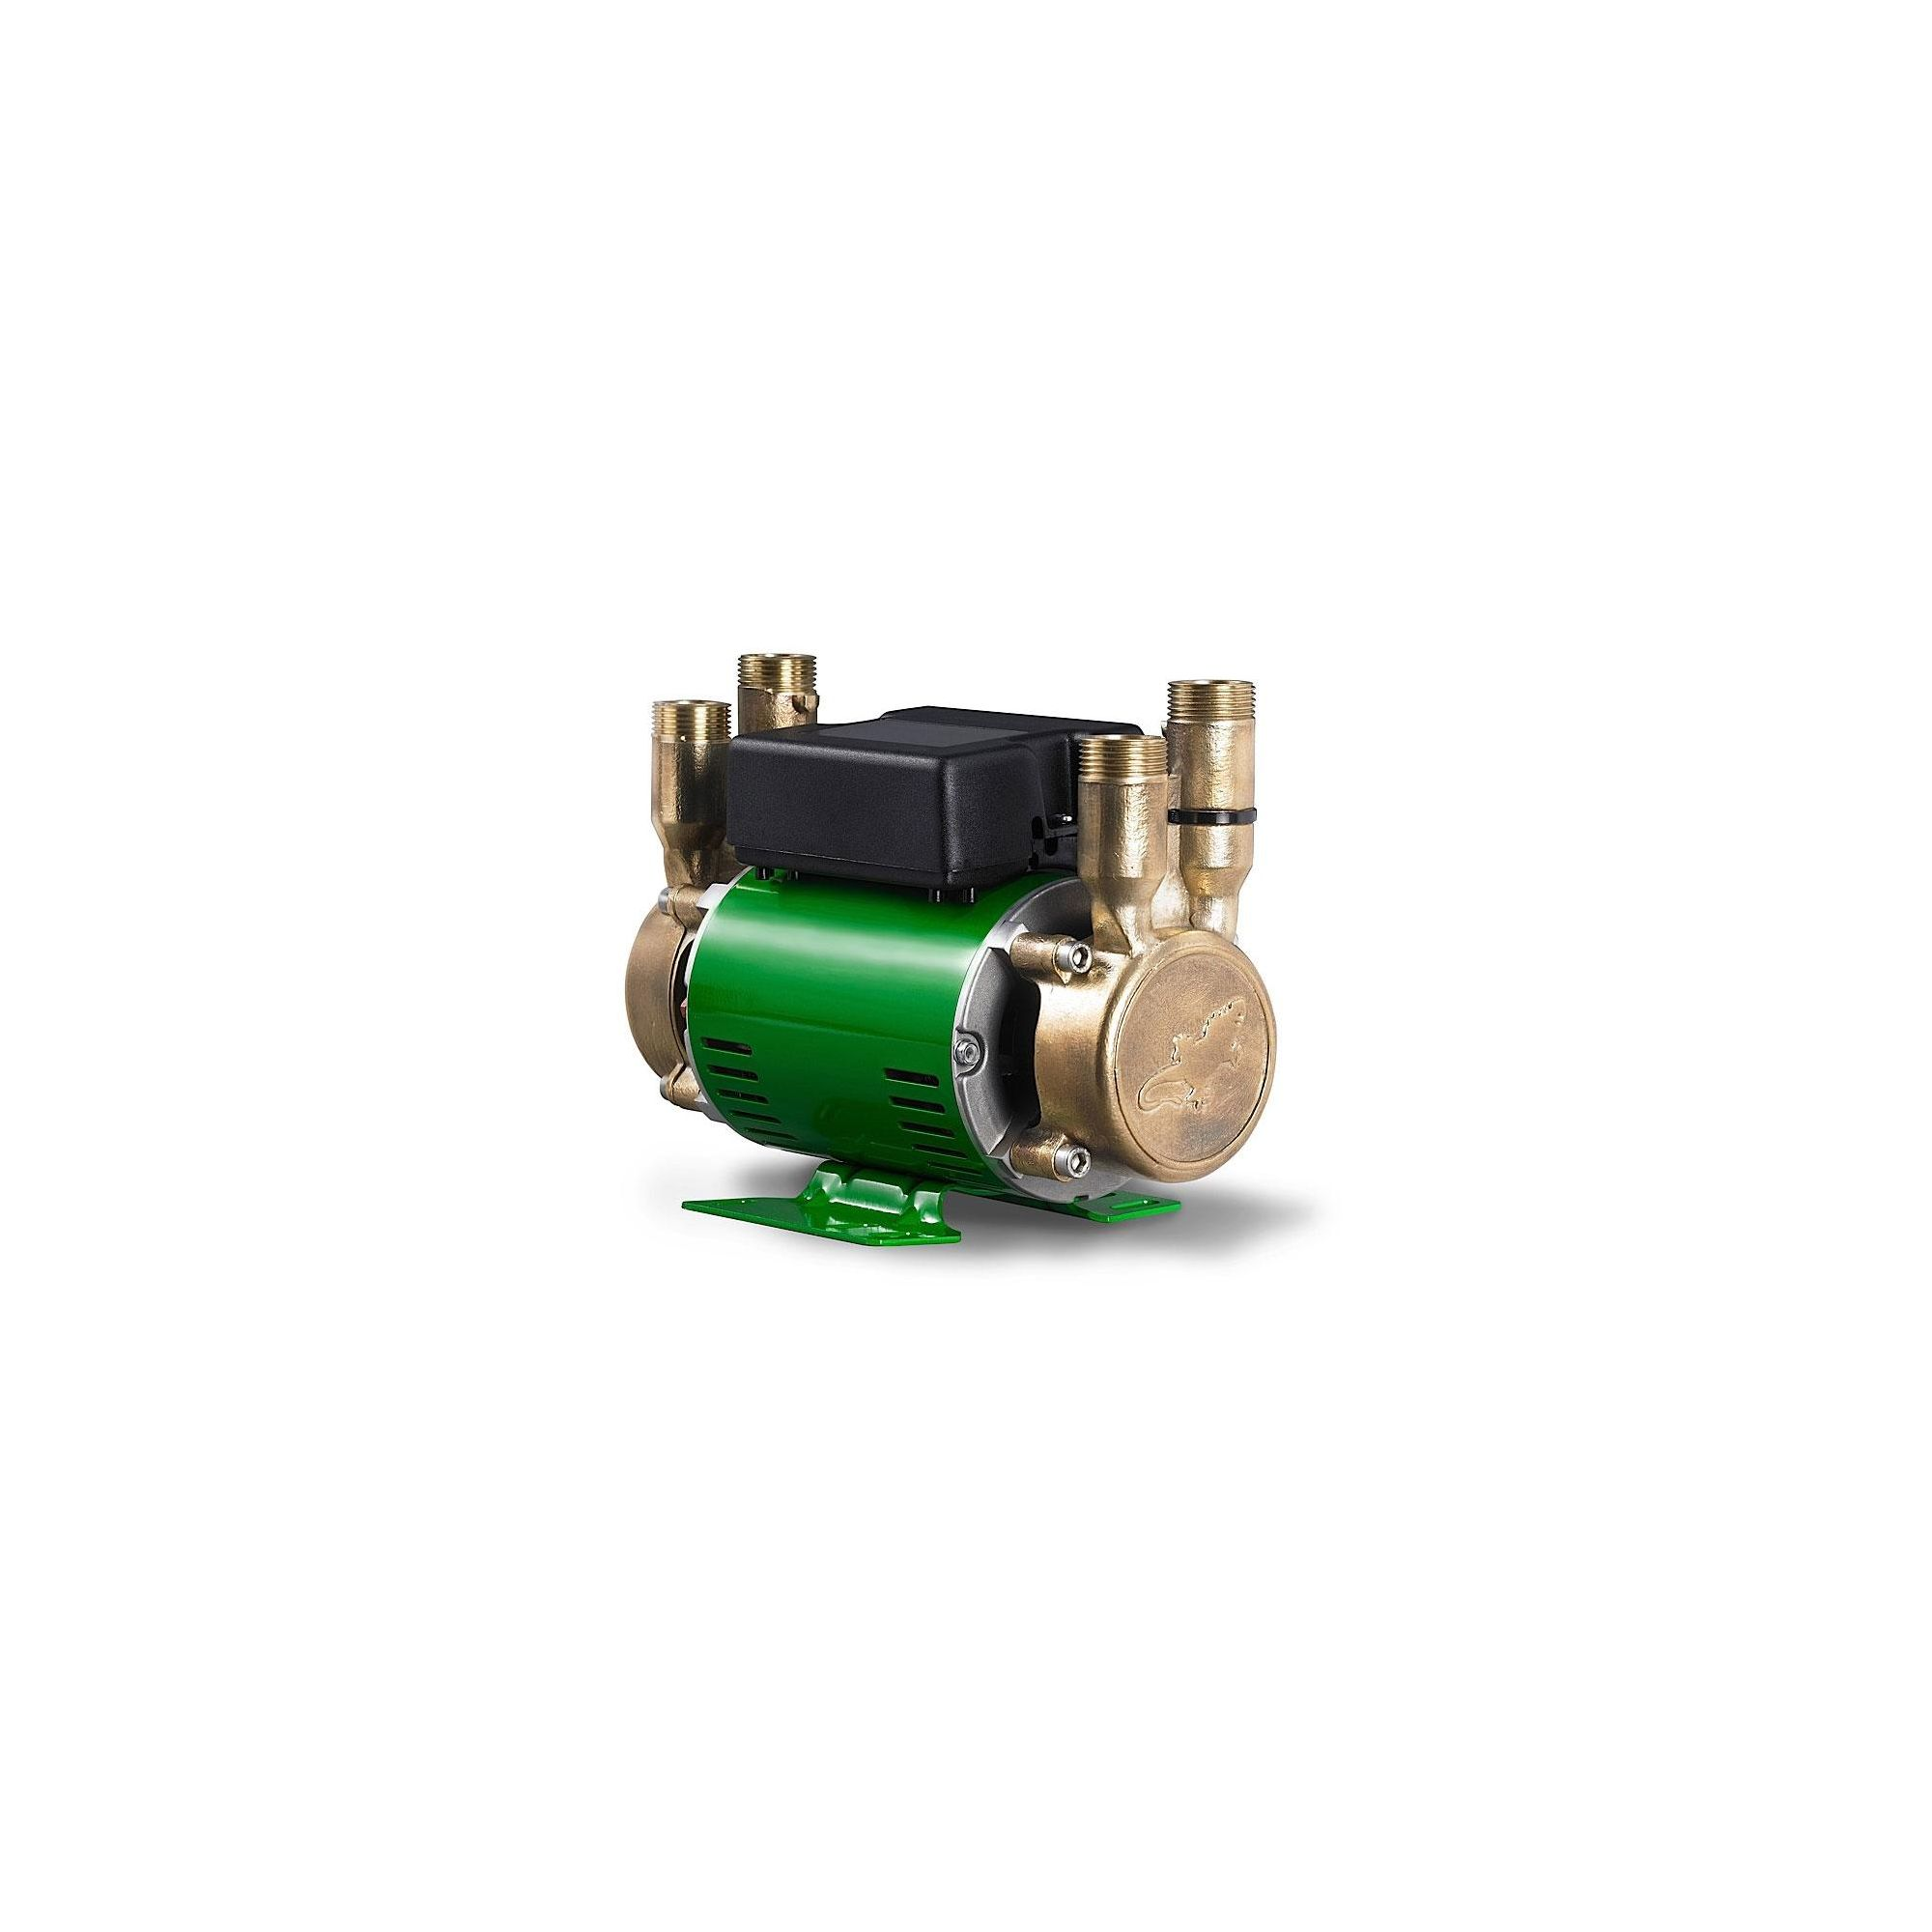 Salamander Force 30 PT Twin Impeller Shower Pump, Positive Head, 3.0 Bar at Tescos Direct